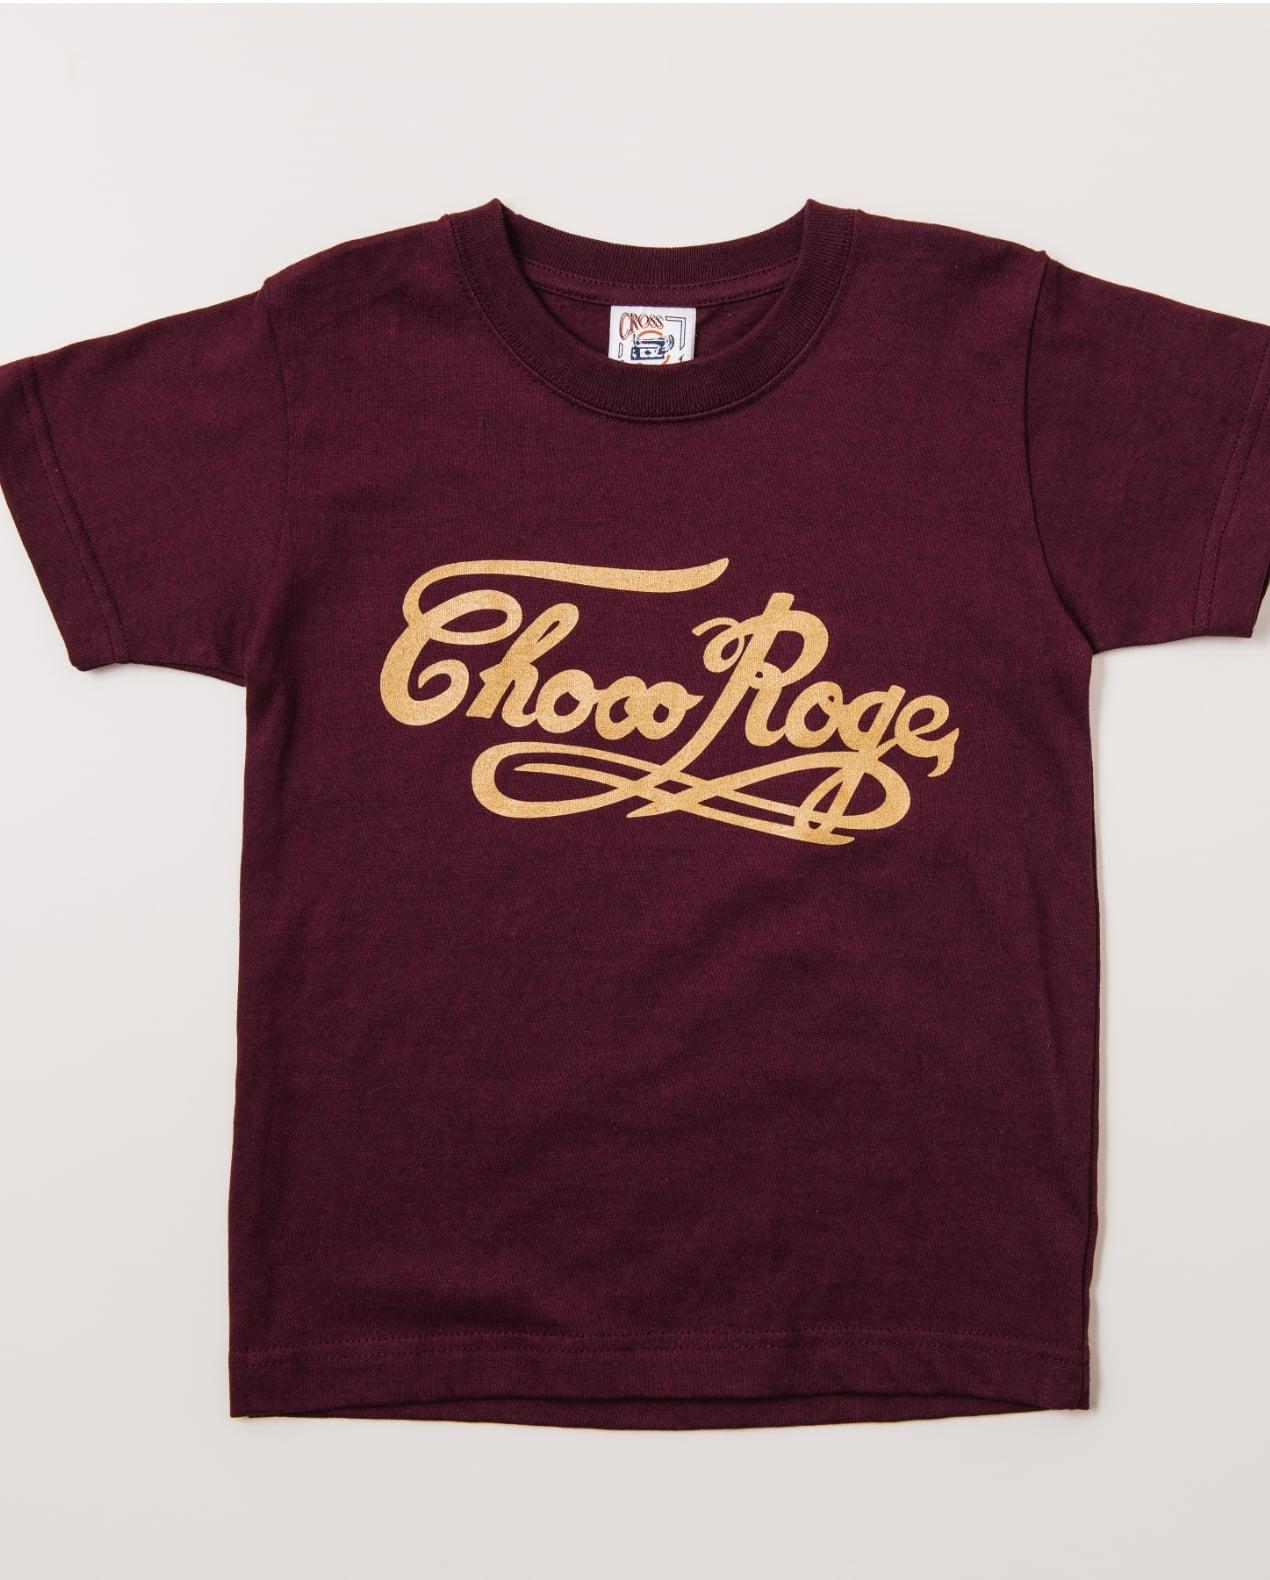 Tシャツ 大人用 茶色 サイズL